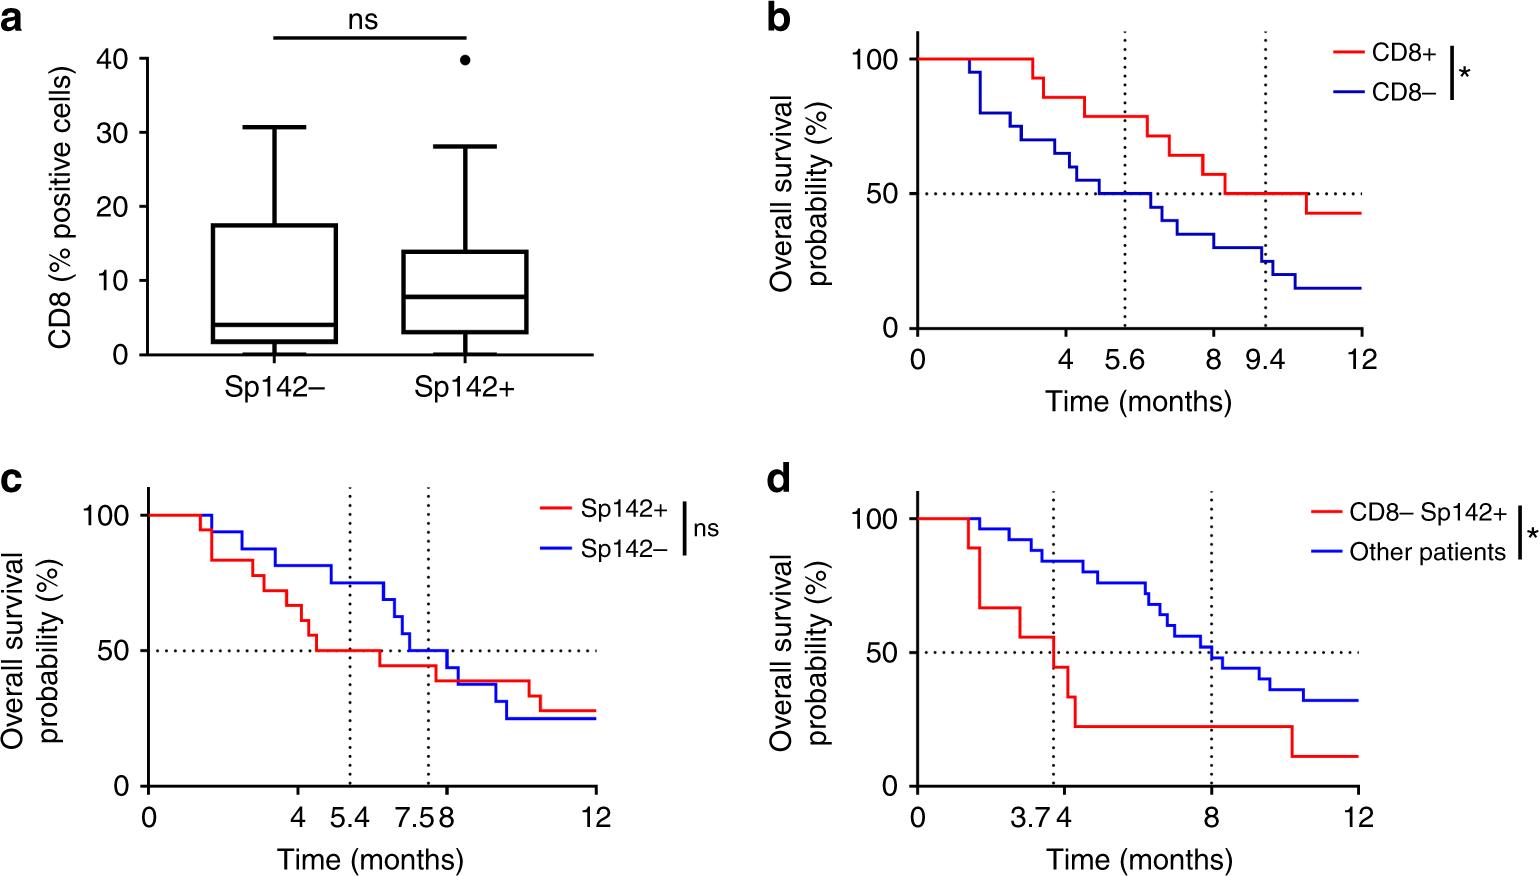 Prognostic and predictive role of CD8 and PD-L1 determination in